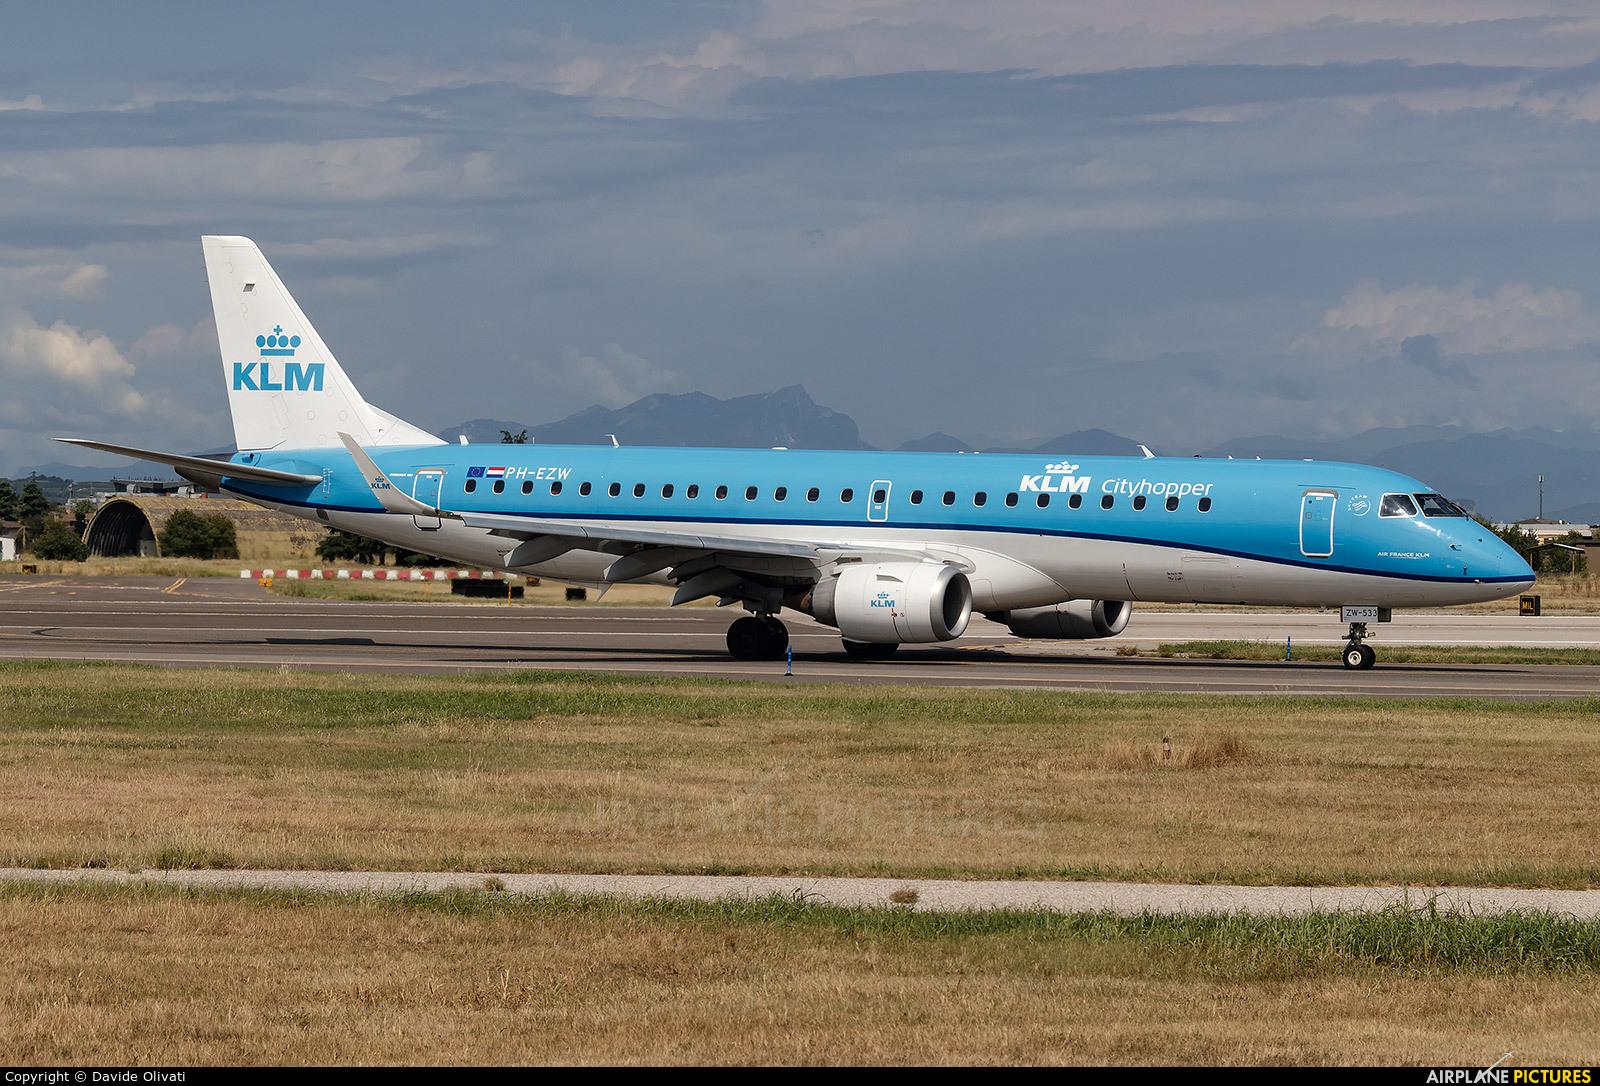 KLM Cityhopper PH-EXV aircraft at Verona - Villafranca